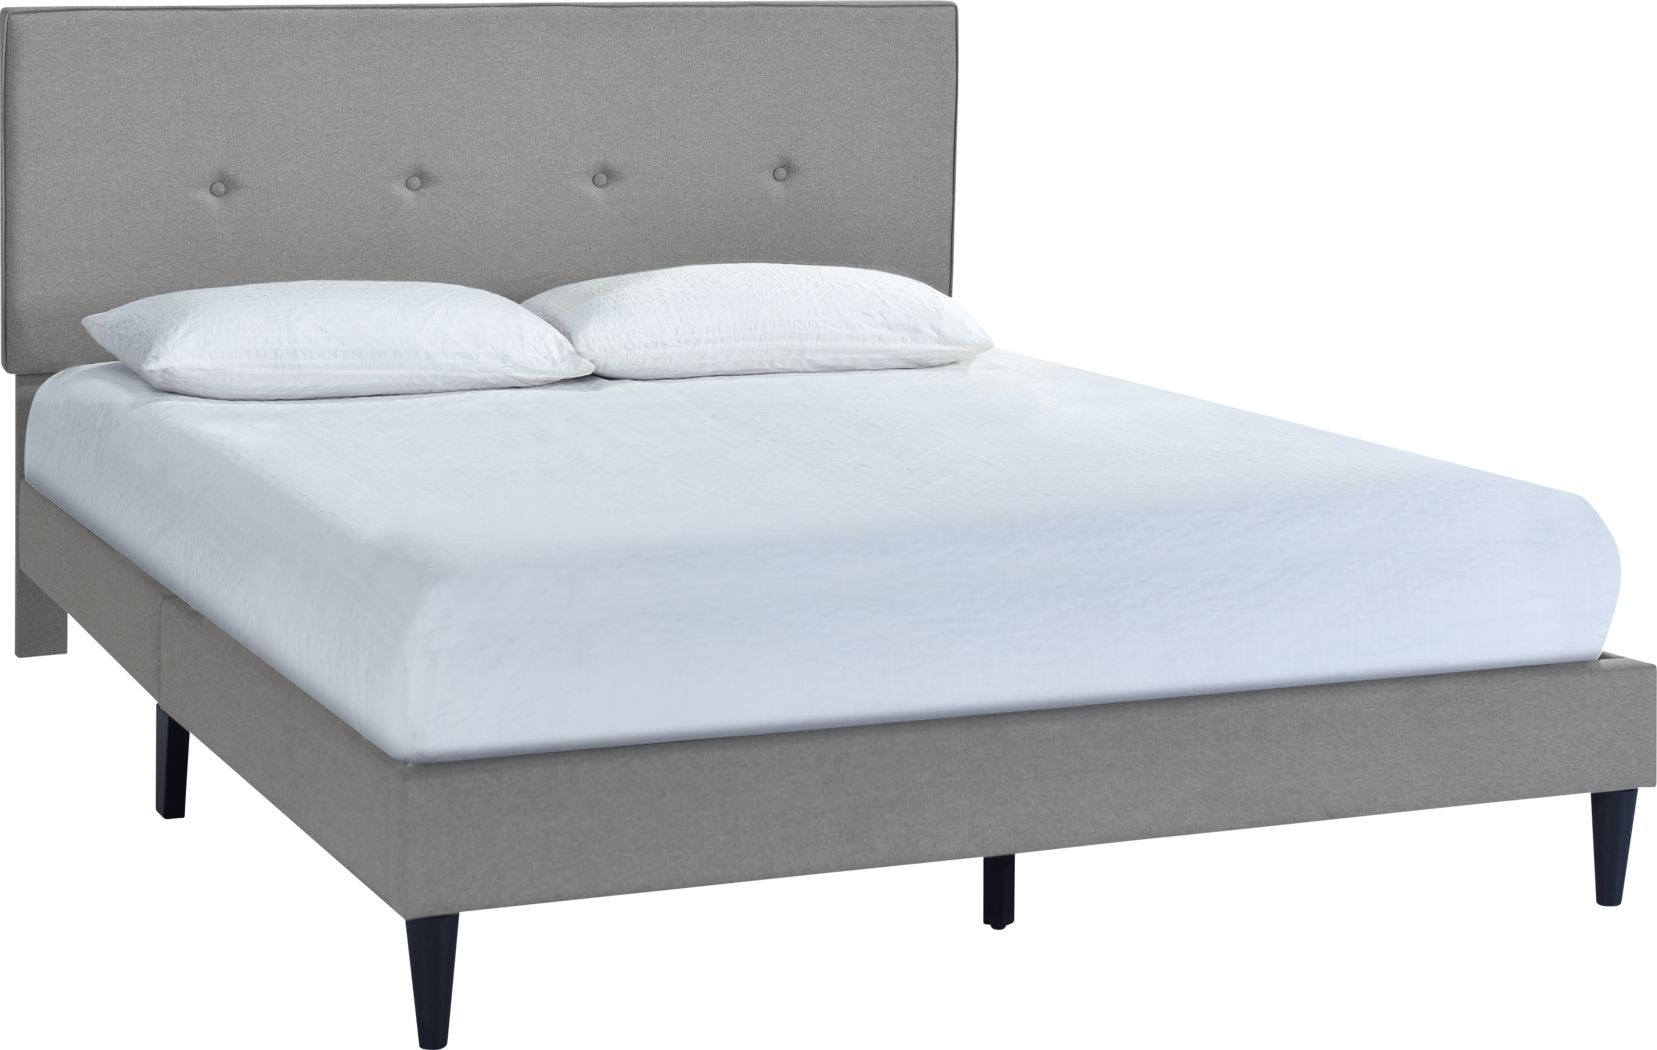 Laventina Gray King Bed